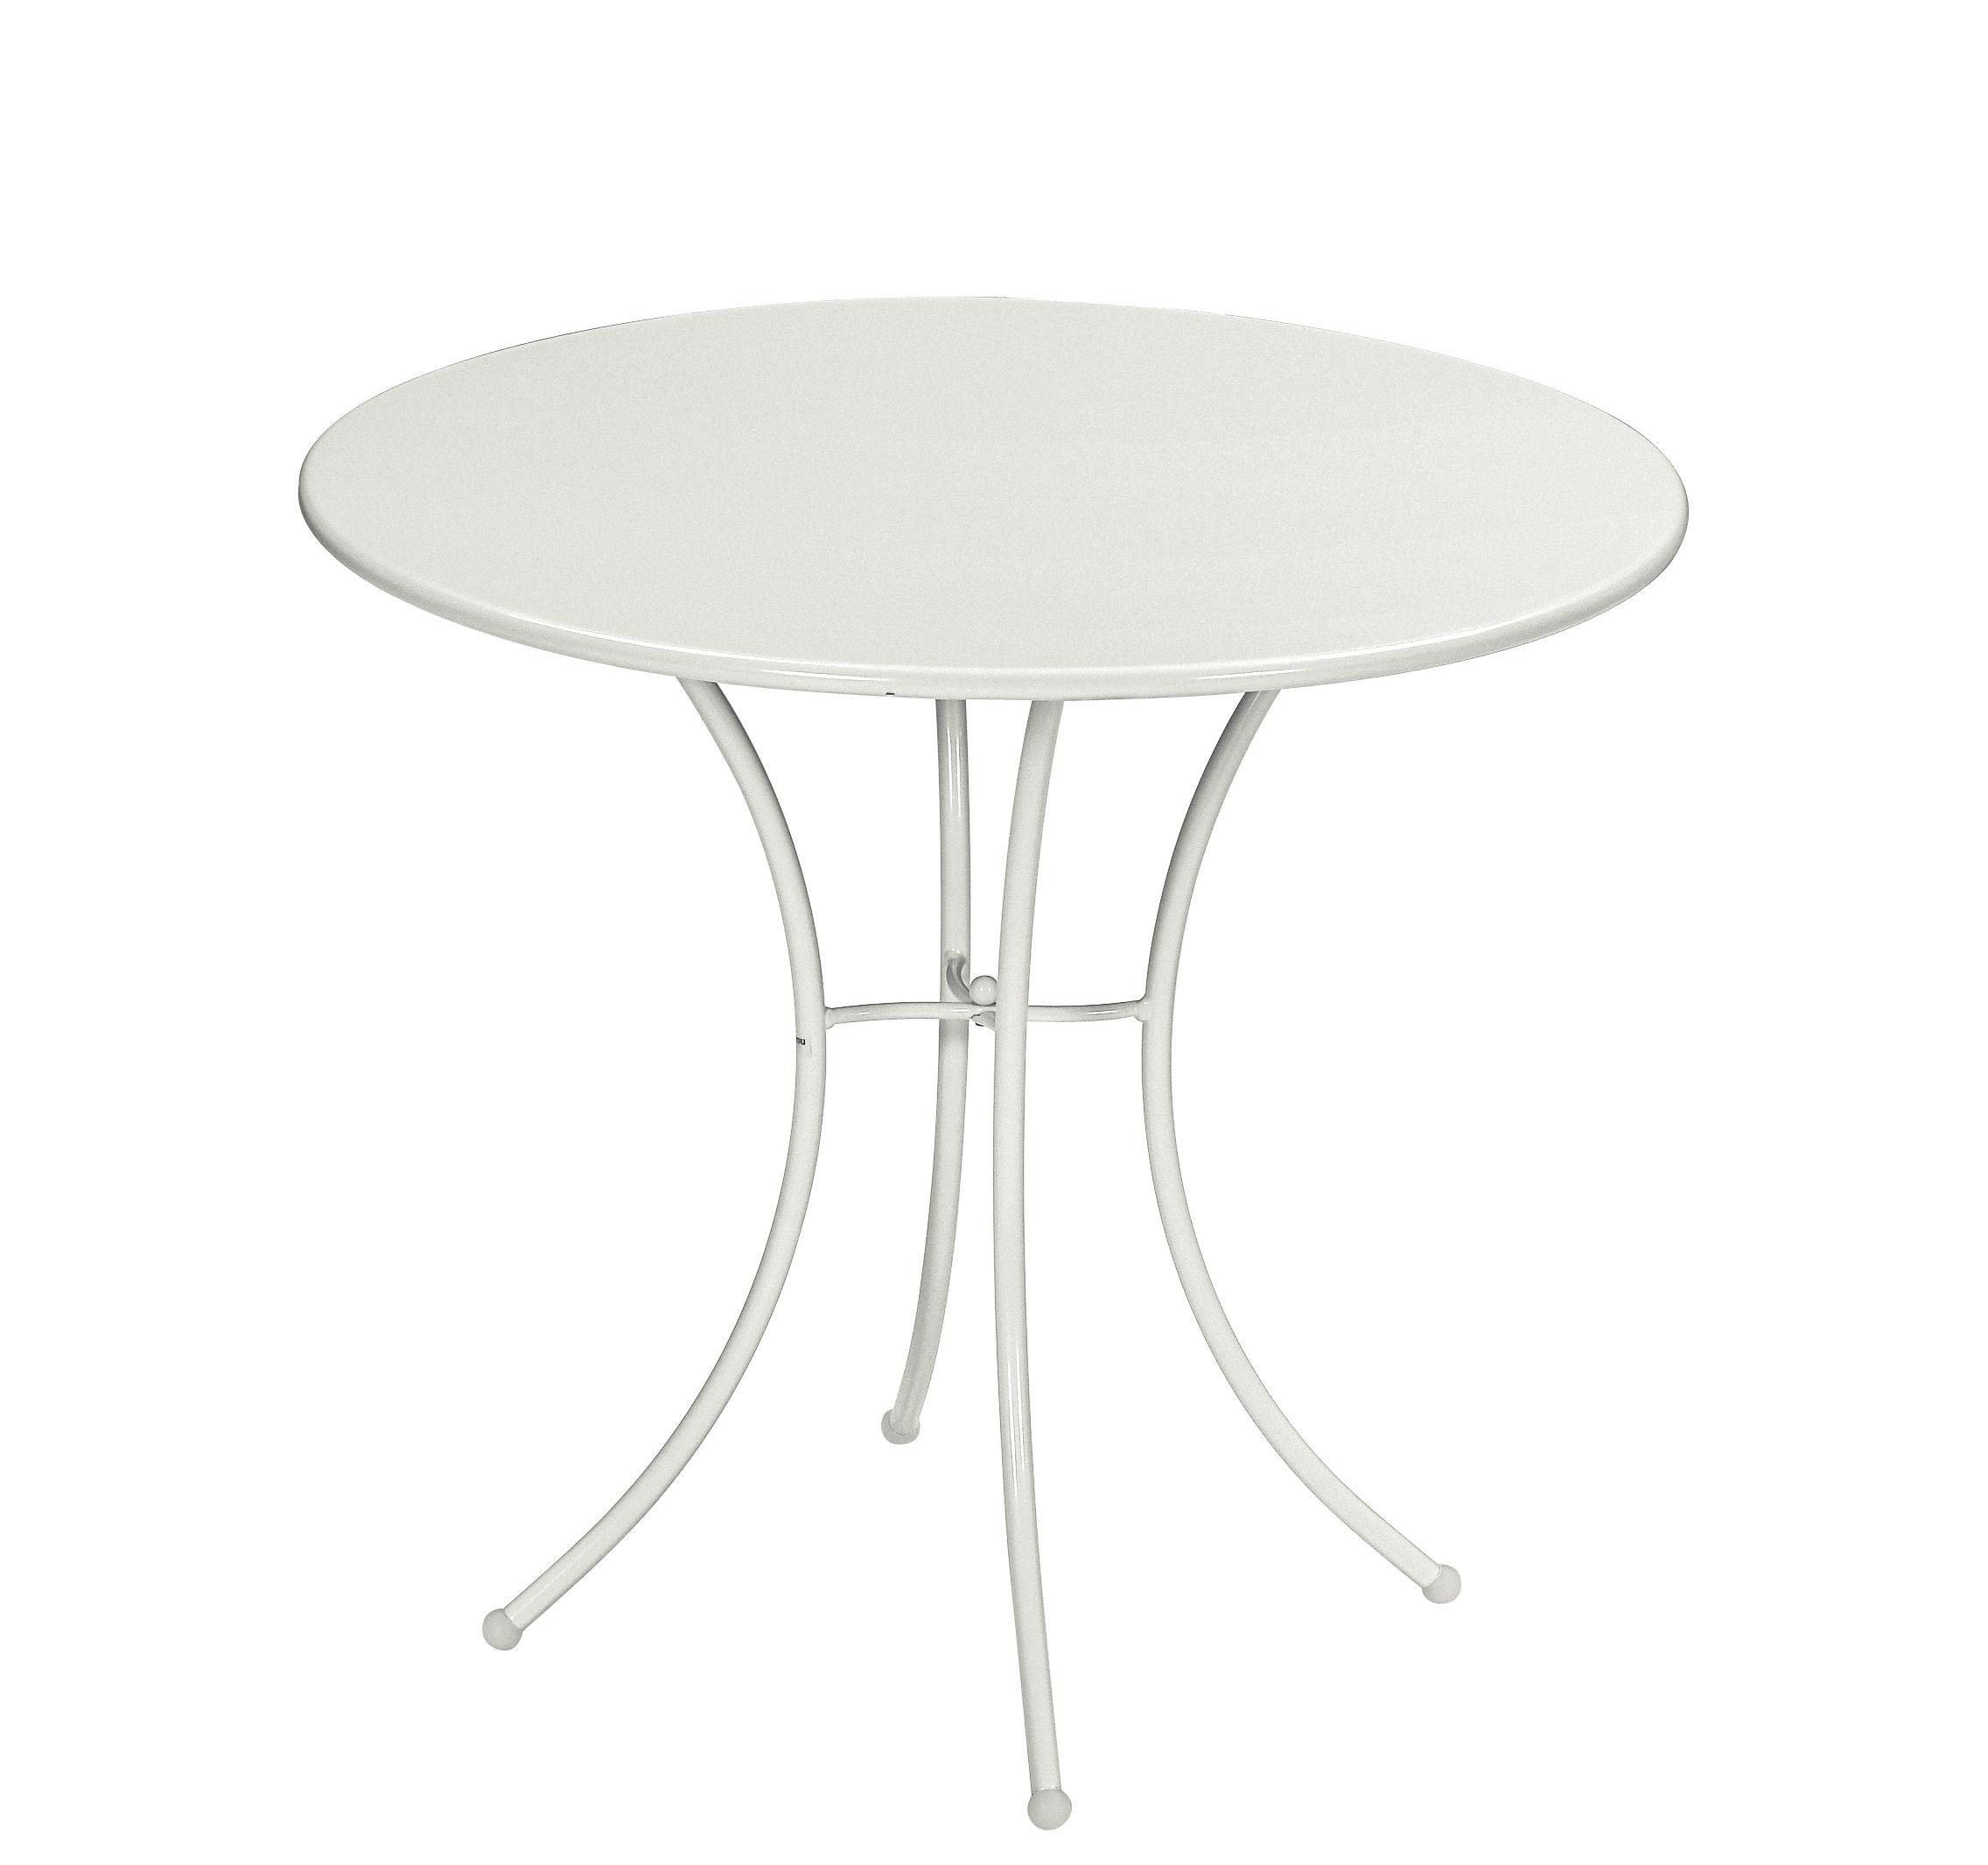 Outdoor - Tavoli  - Tavolo rotondo Pigalle - / Metallo - Ø 80 cm di Emu - Bianco - Acciaio verniciato